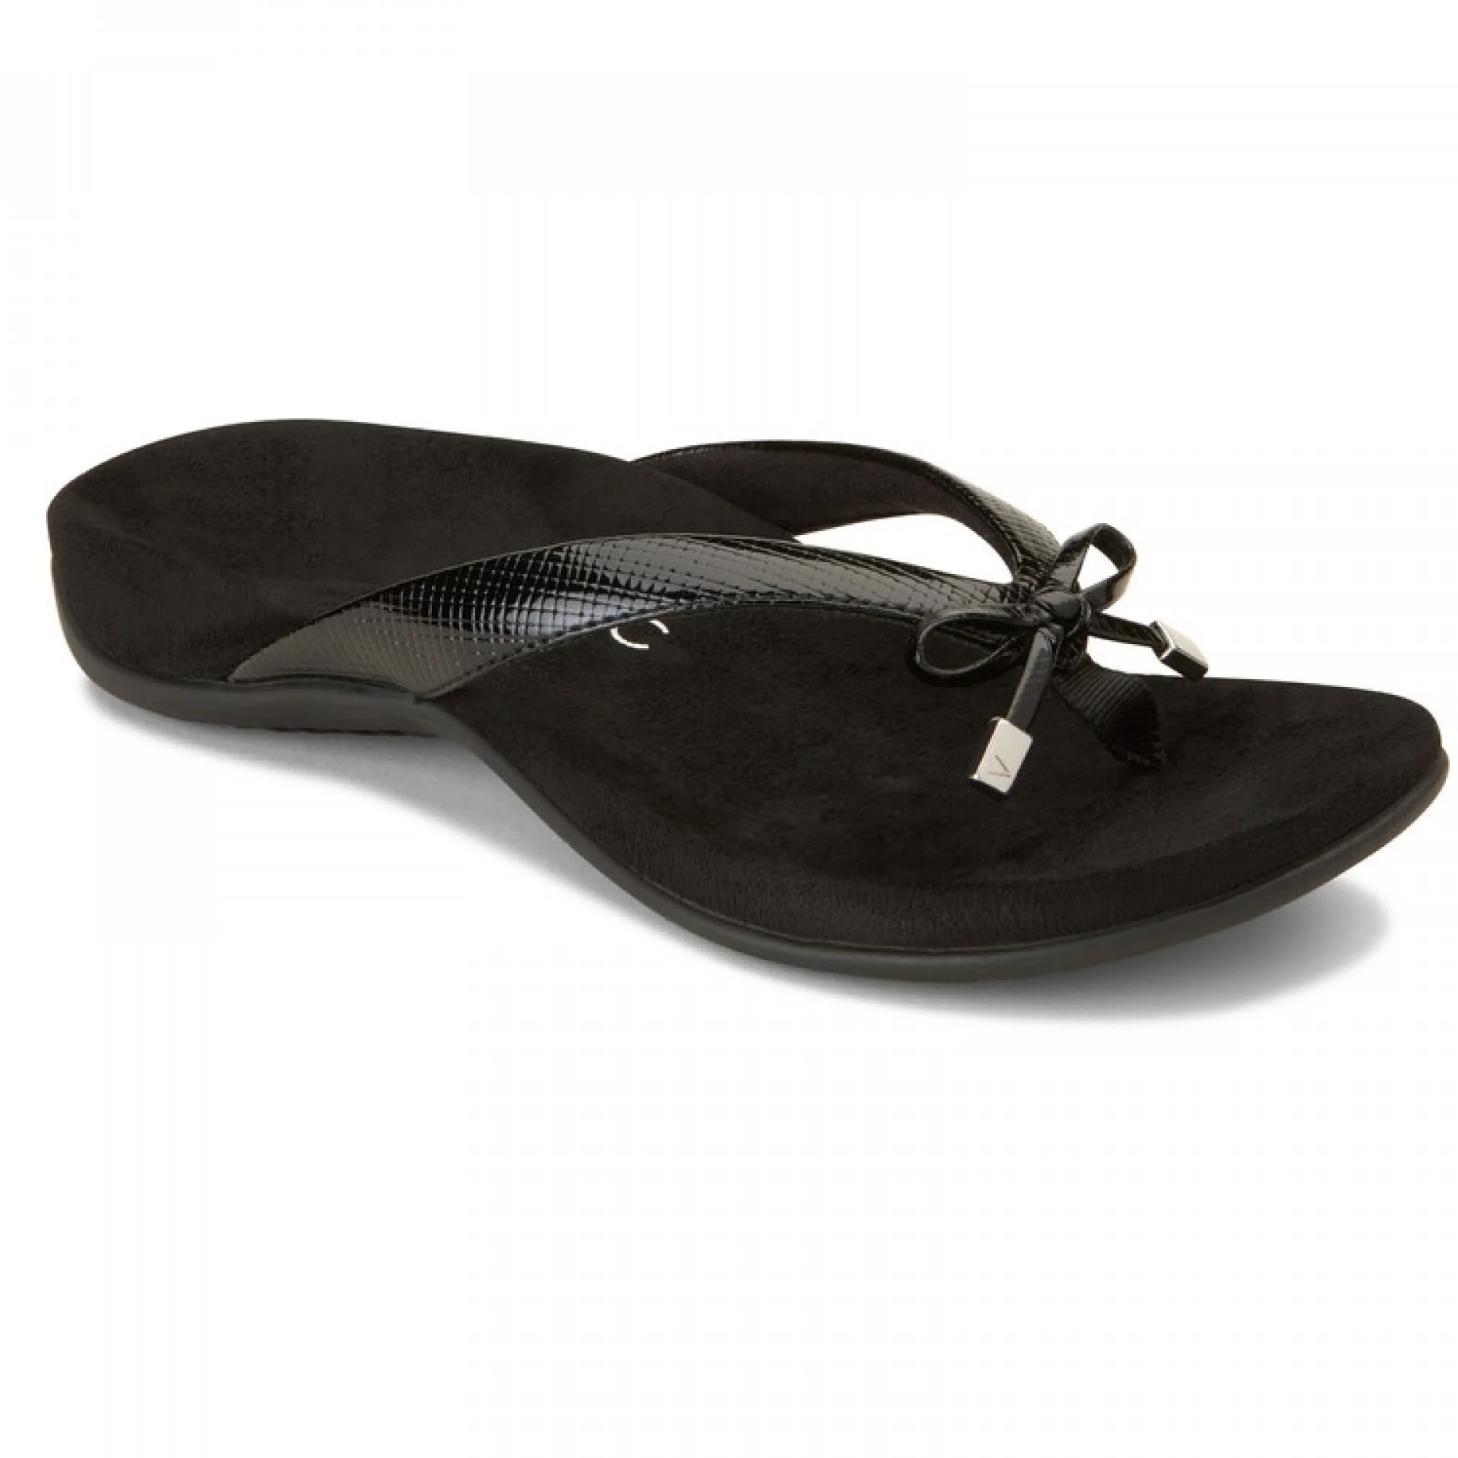 77cdd8ea69a Vionic Women s Bella II Toe-Post Sandal Black Lizard